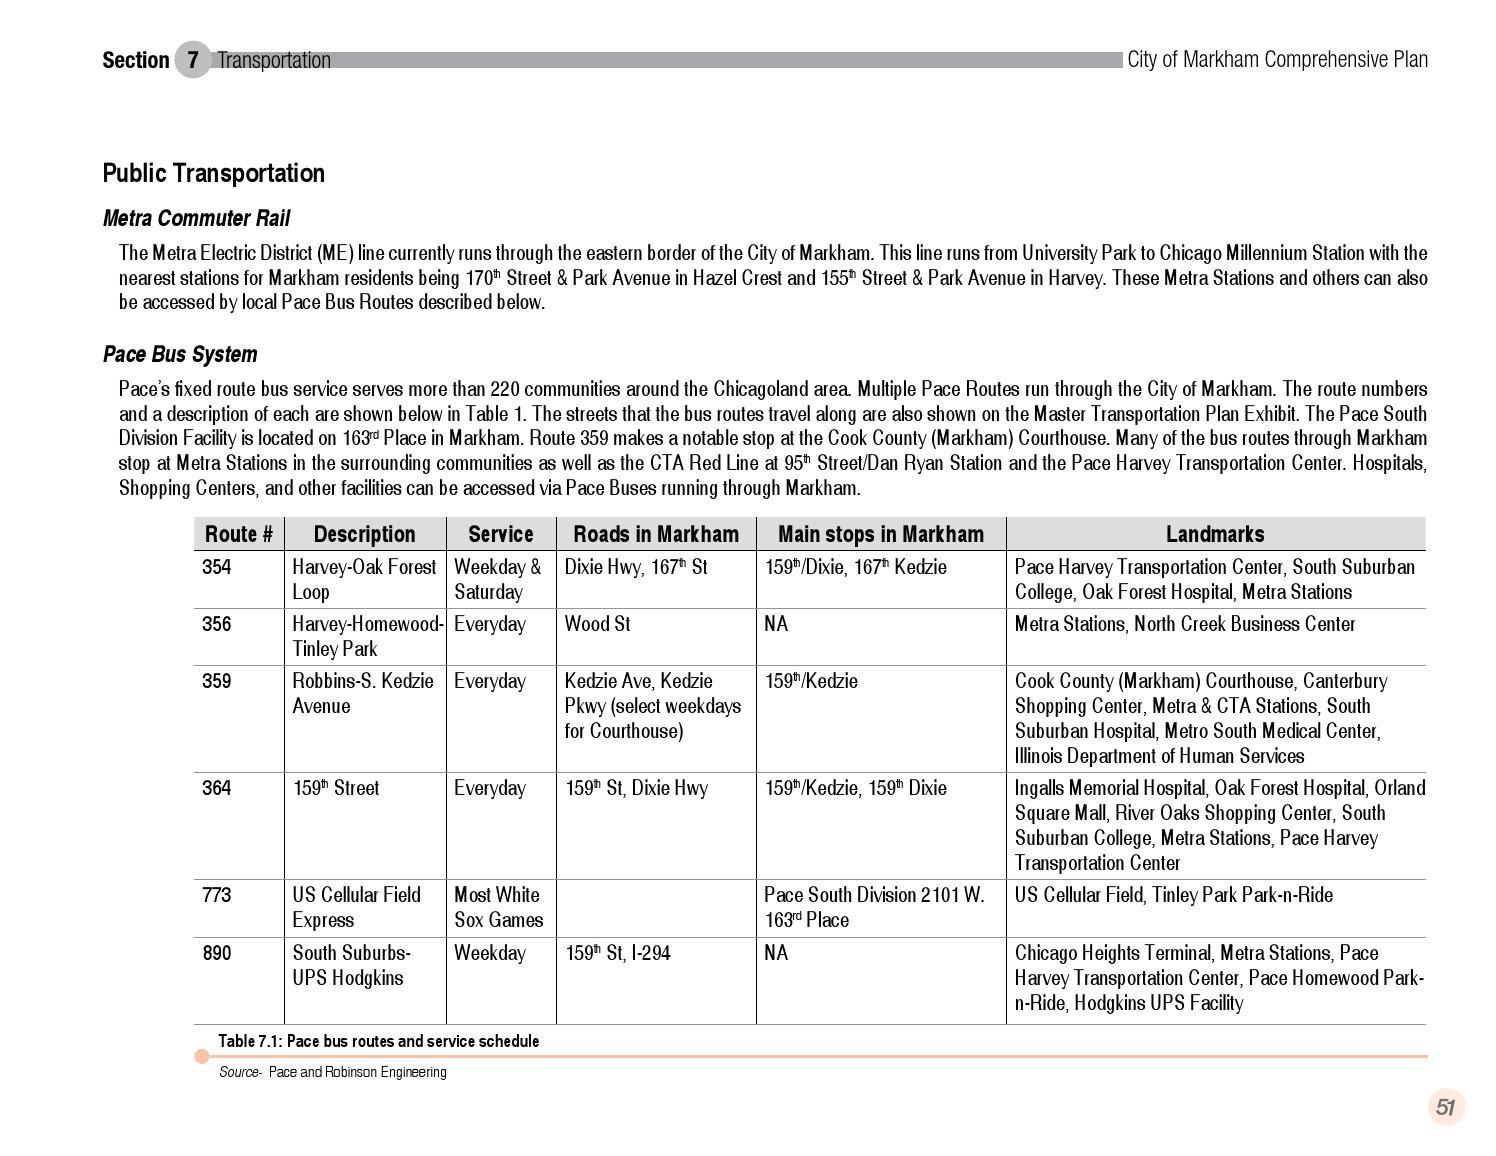 city of markham comprehensive plan by teska associates, inc. - issuu